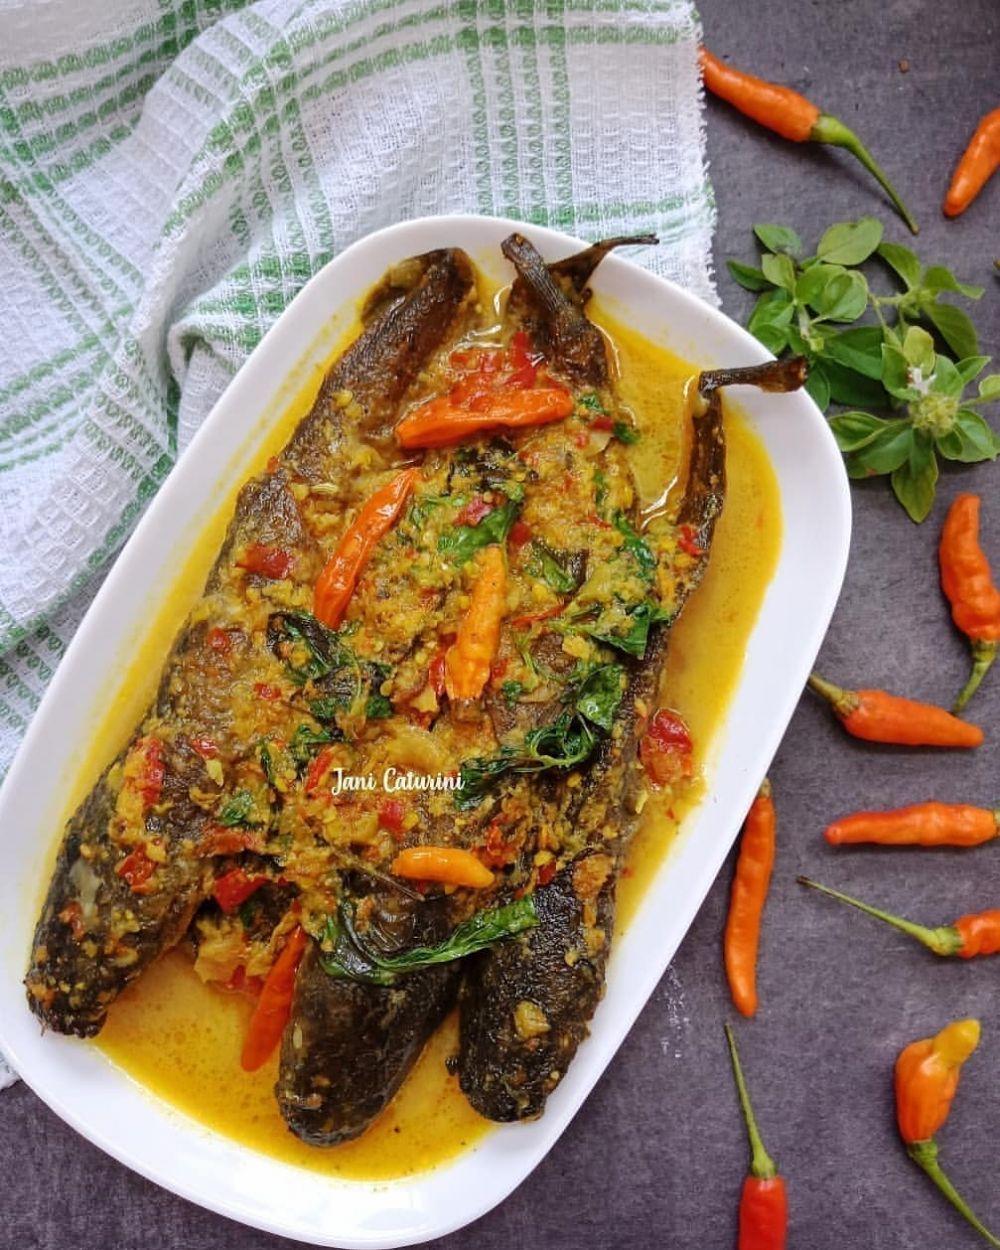 20 Resep Masakan Ikan Lele Enak Instagram In 2020